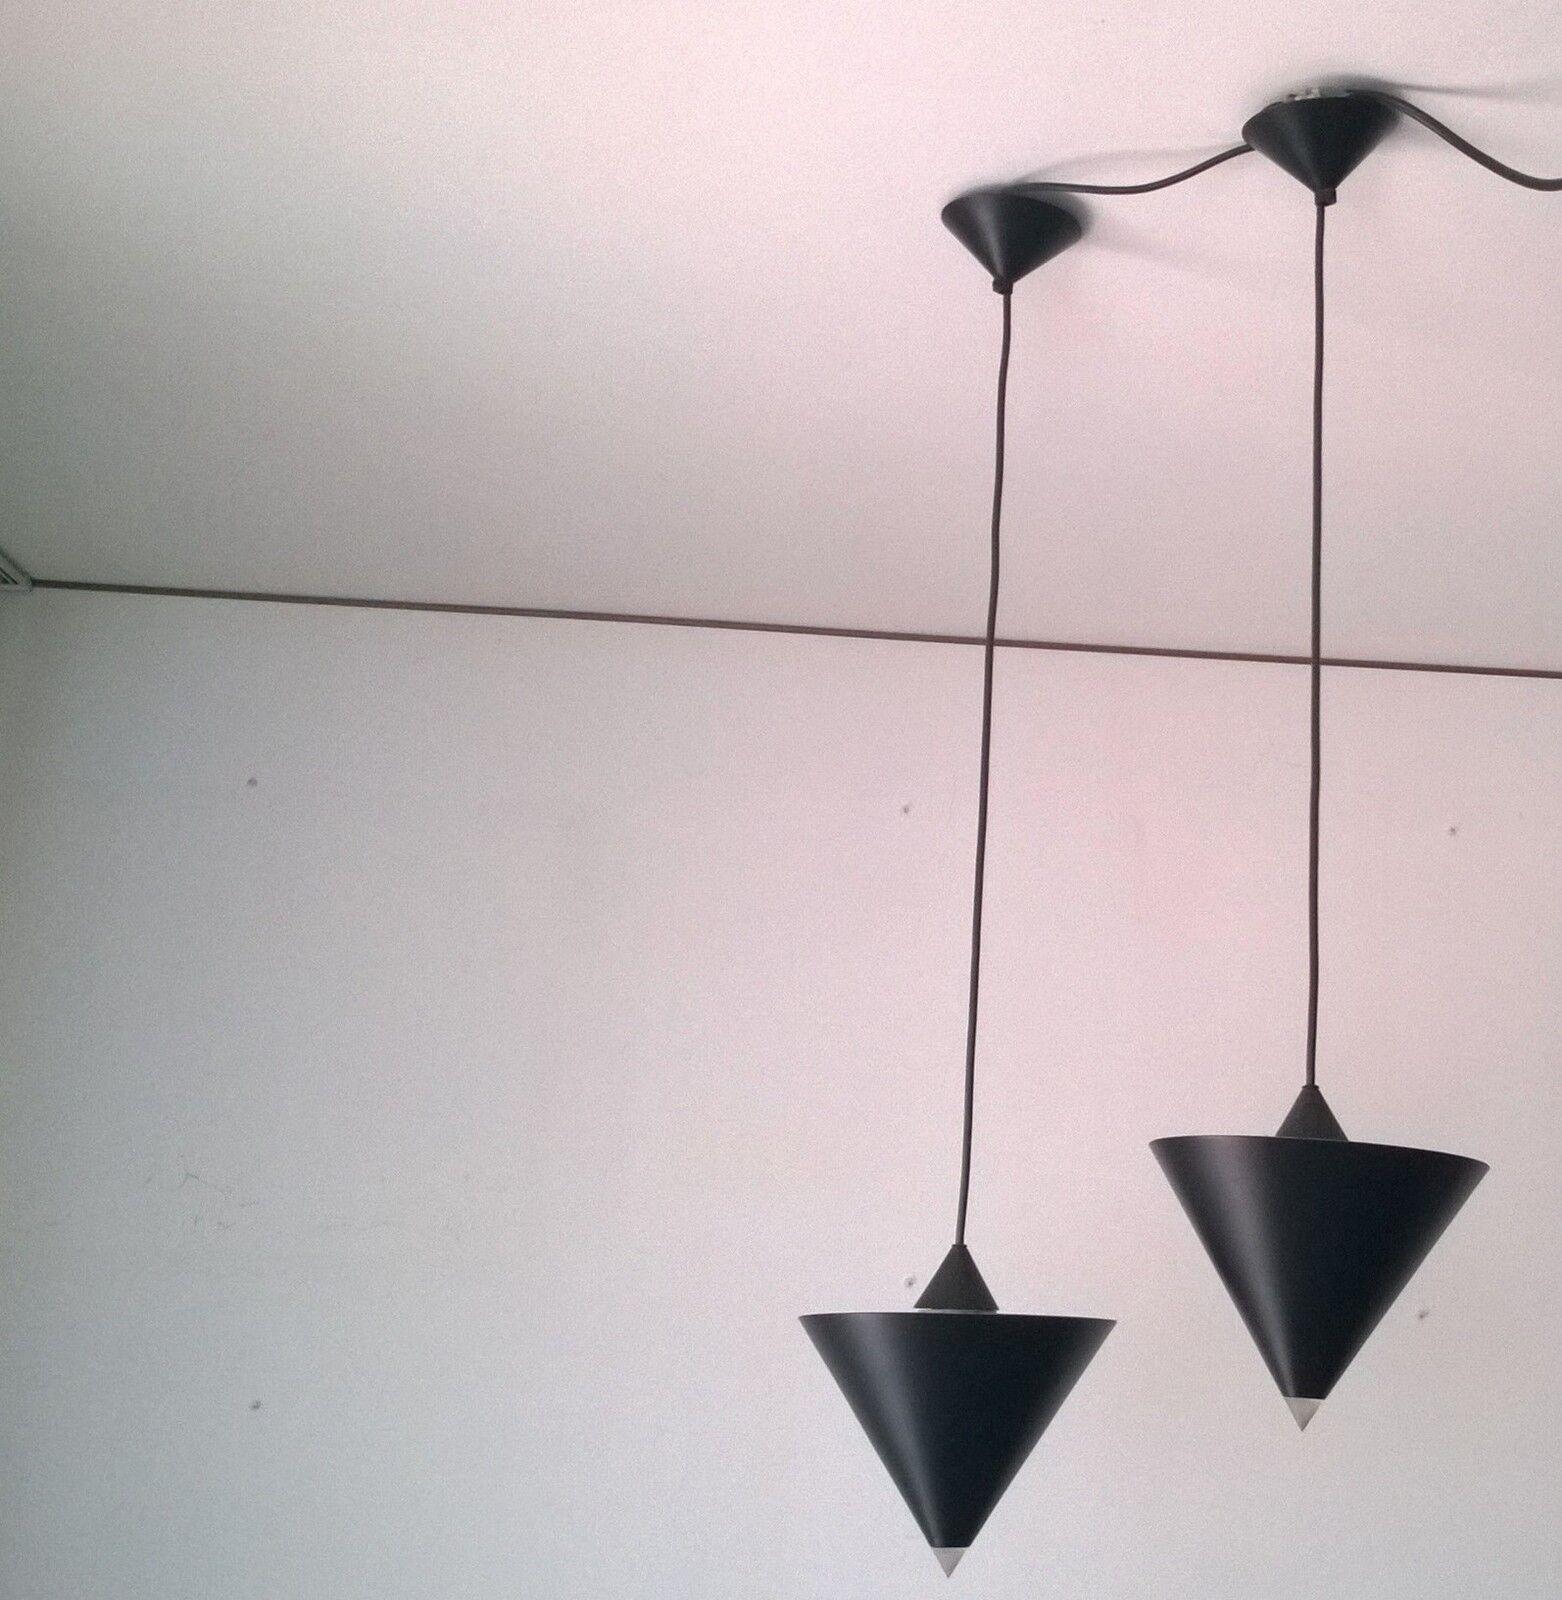 Gary Morga rot POINT POINT POINT Bieffeplast lampadario light lamp chandelier lampada design 734a2c